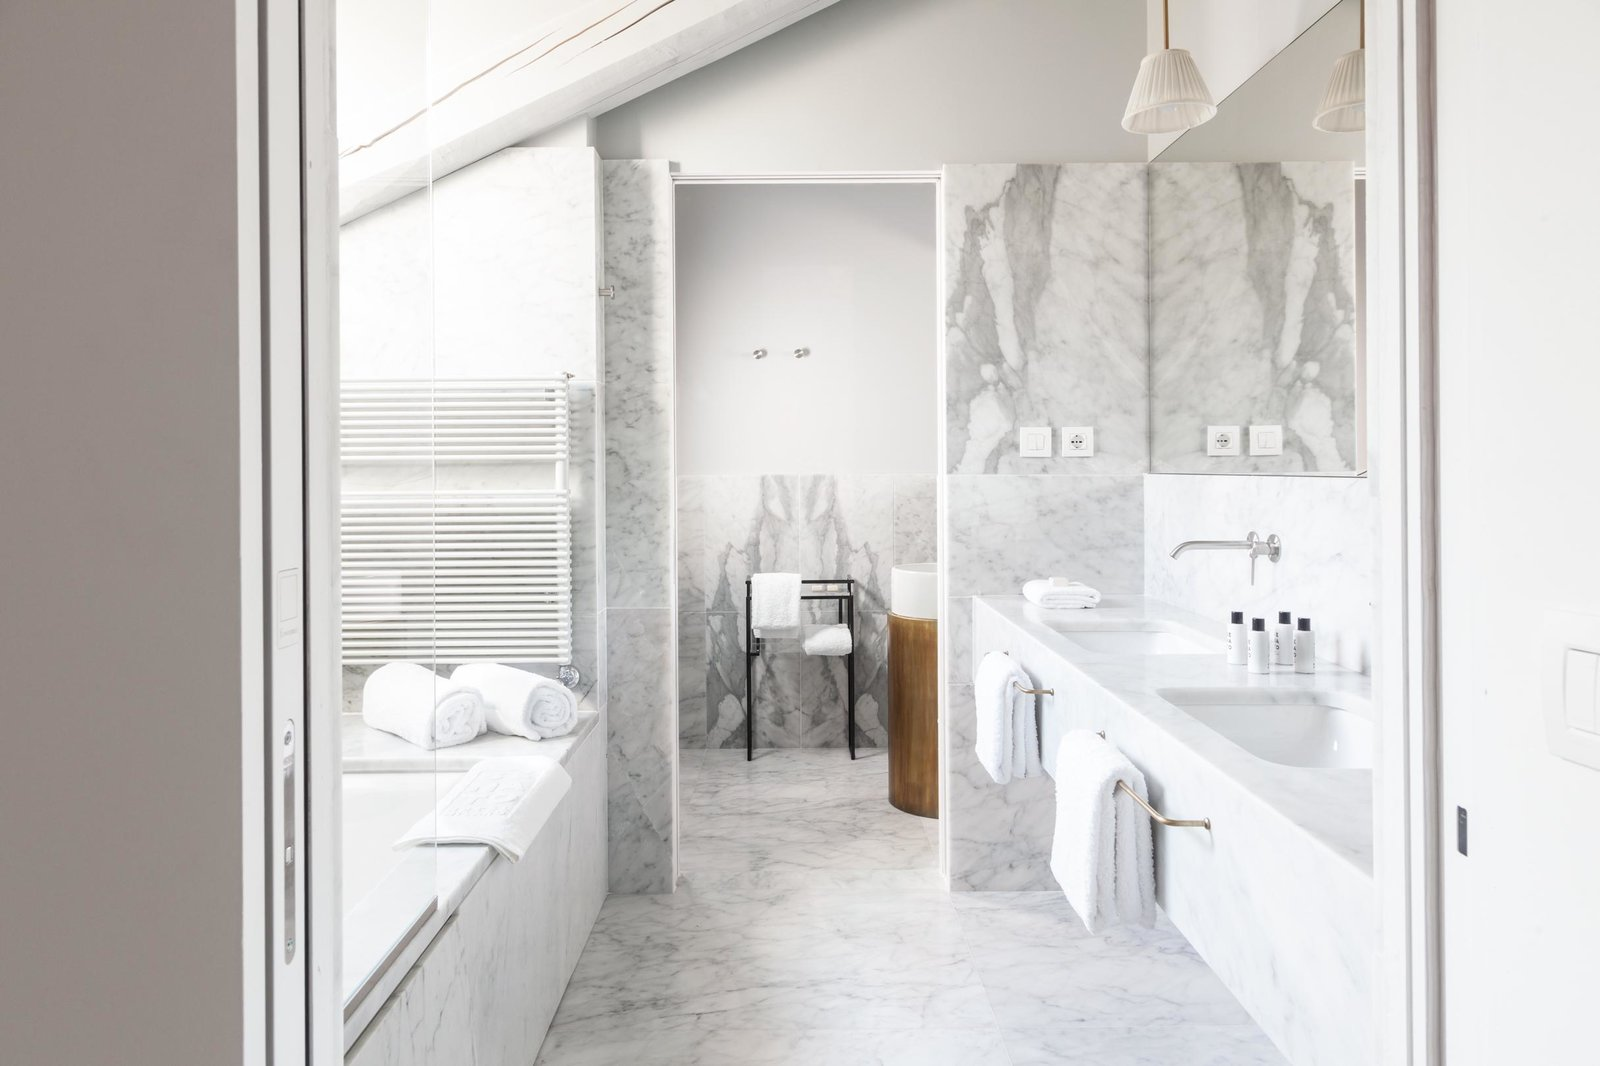 Bath, Undermount, Marble, Pendant, Undermount, and Marble  Bath Undermount Pendant Photos from Senato Hotel Milano